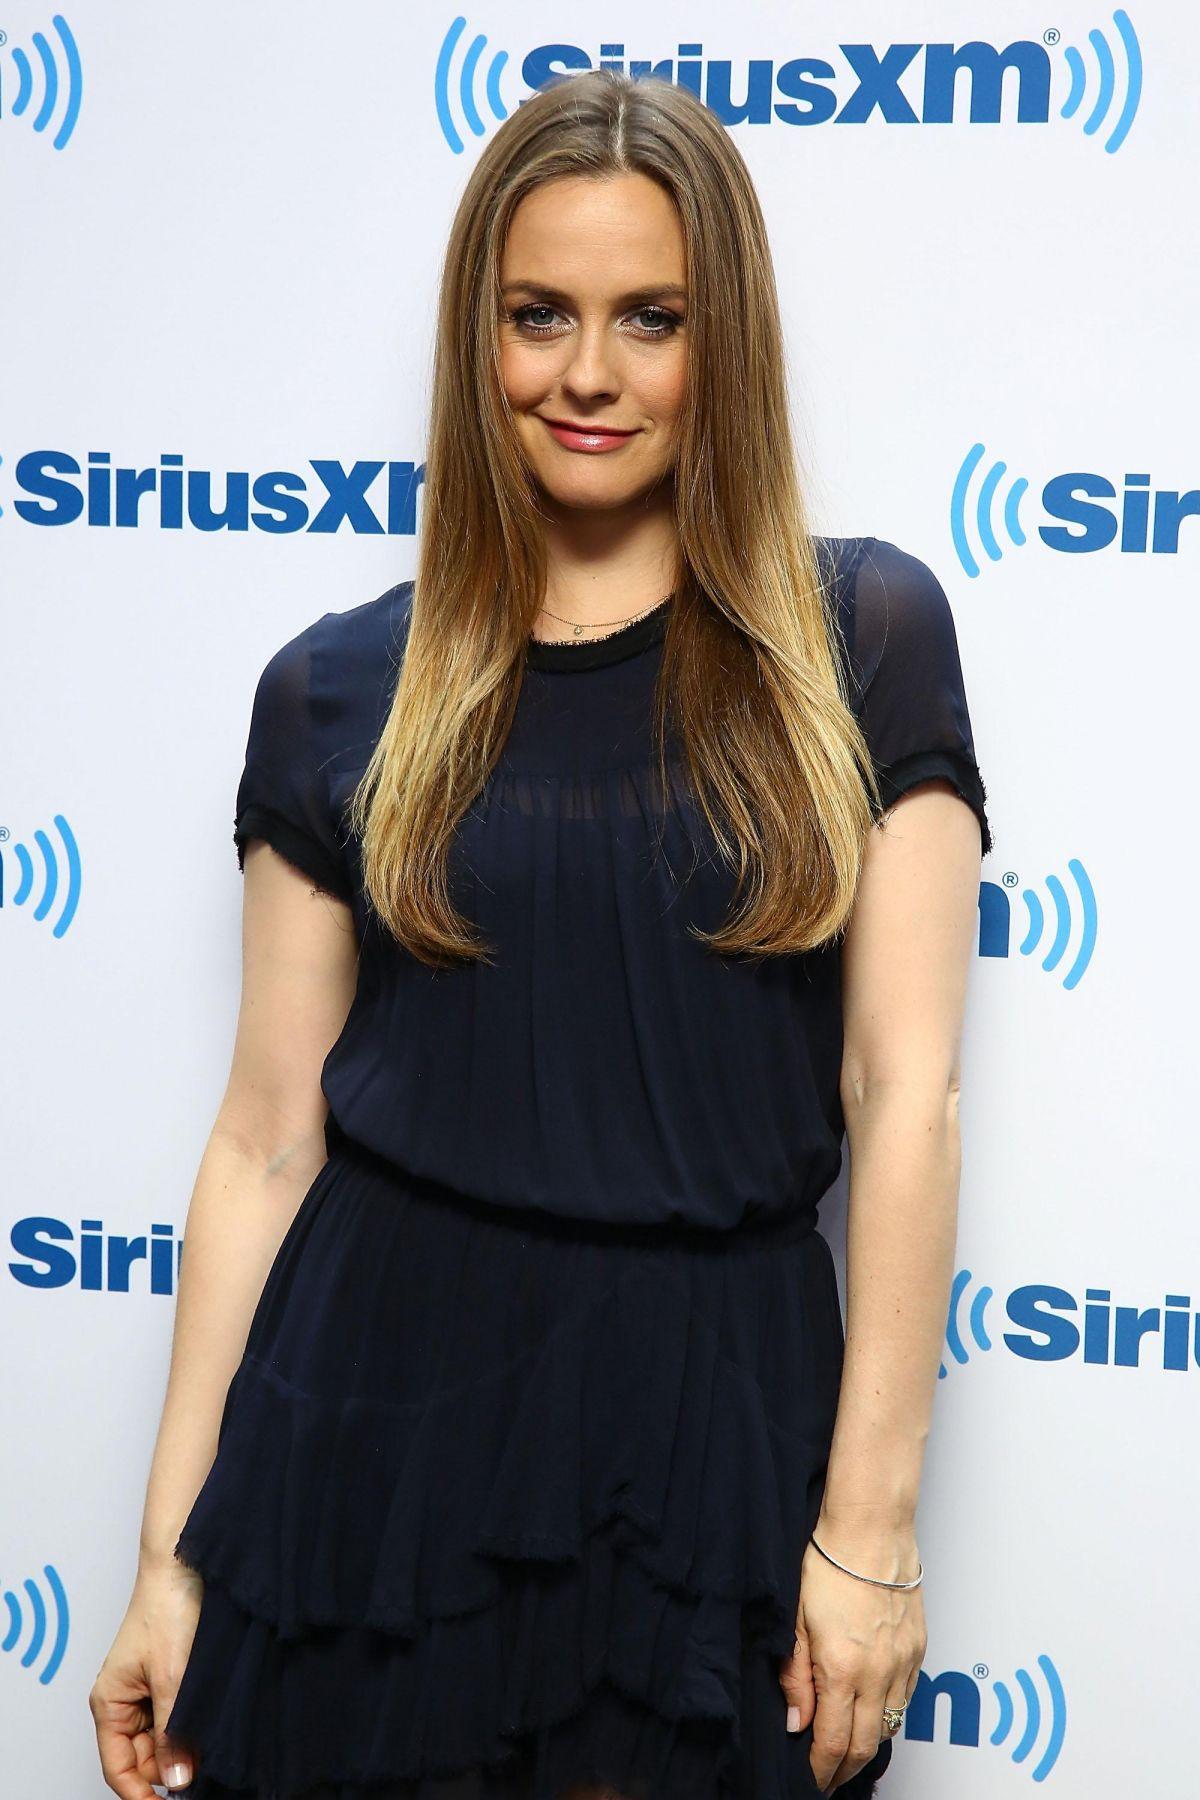 ALICIA SILVERSTONE at SiriusXM Studios in New York